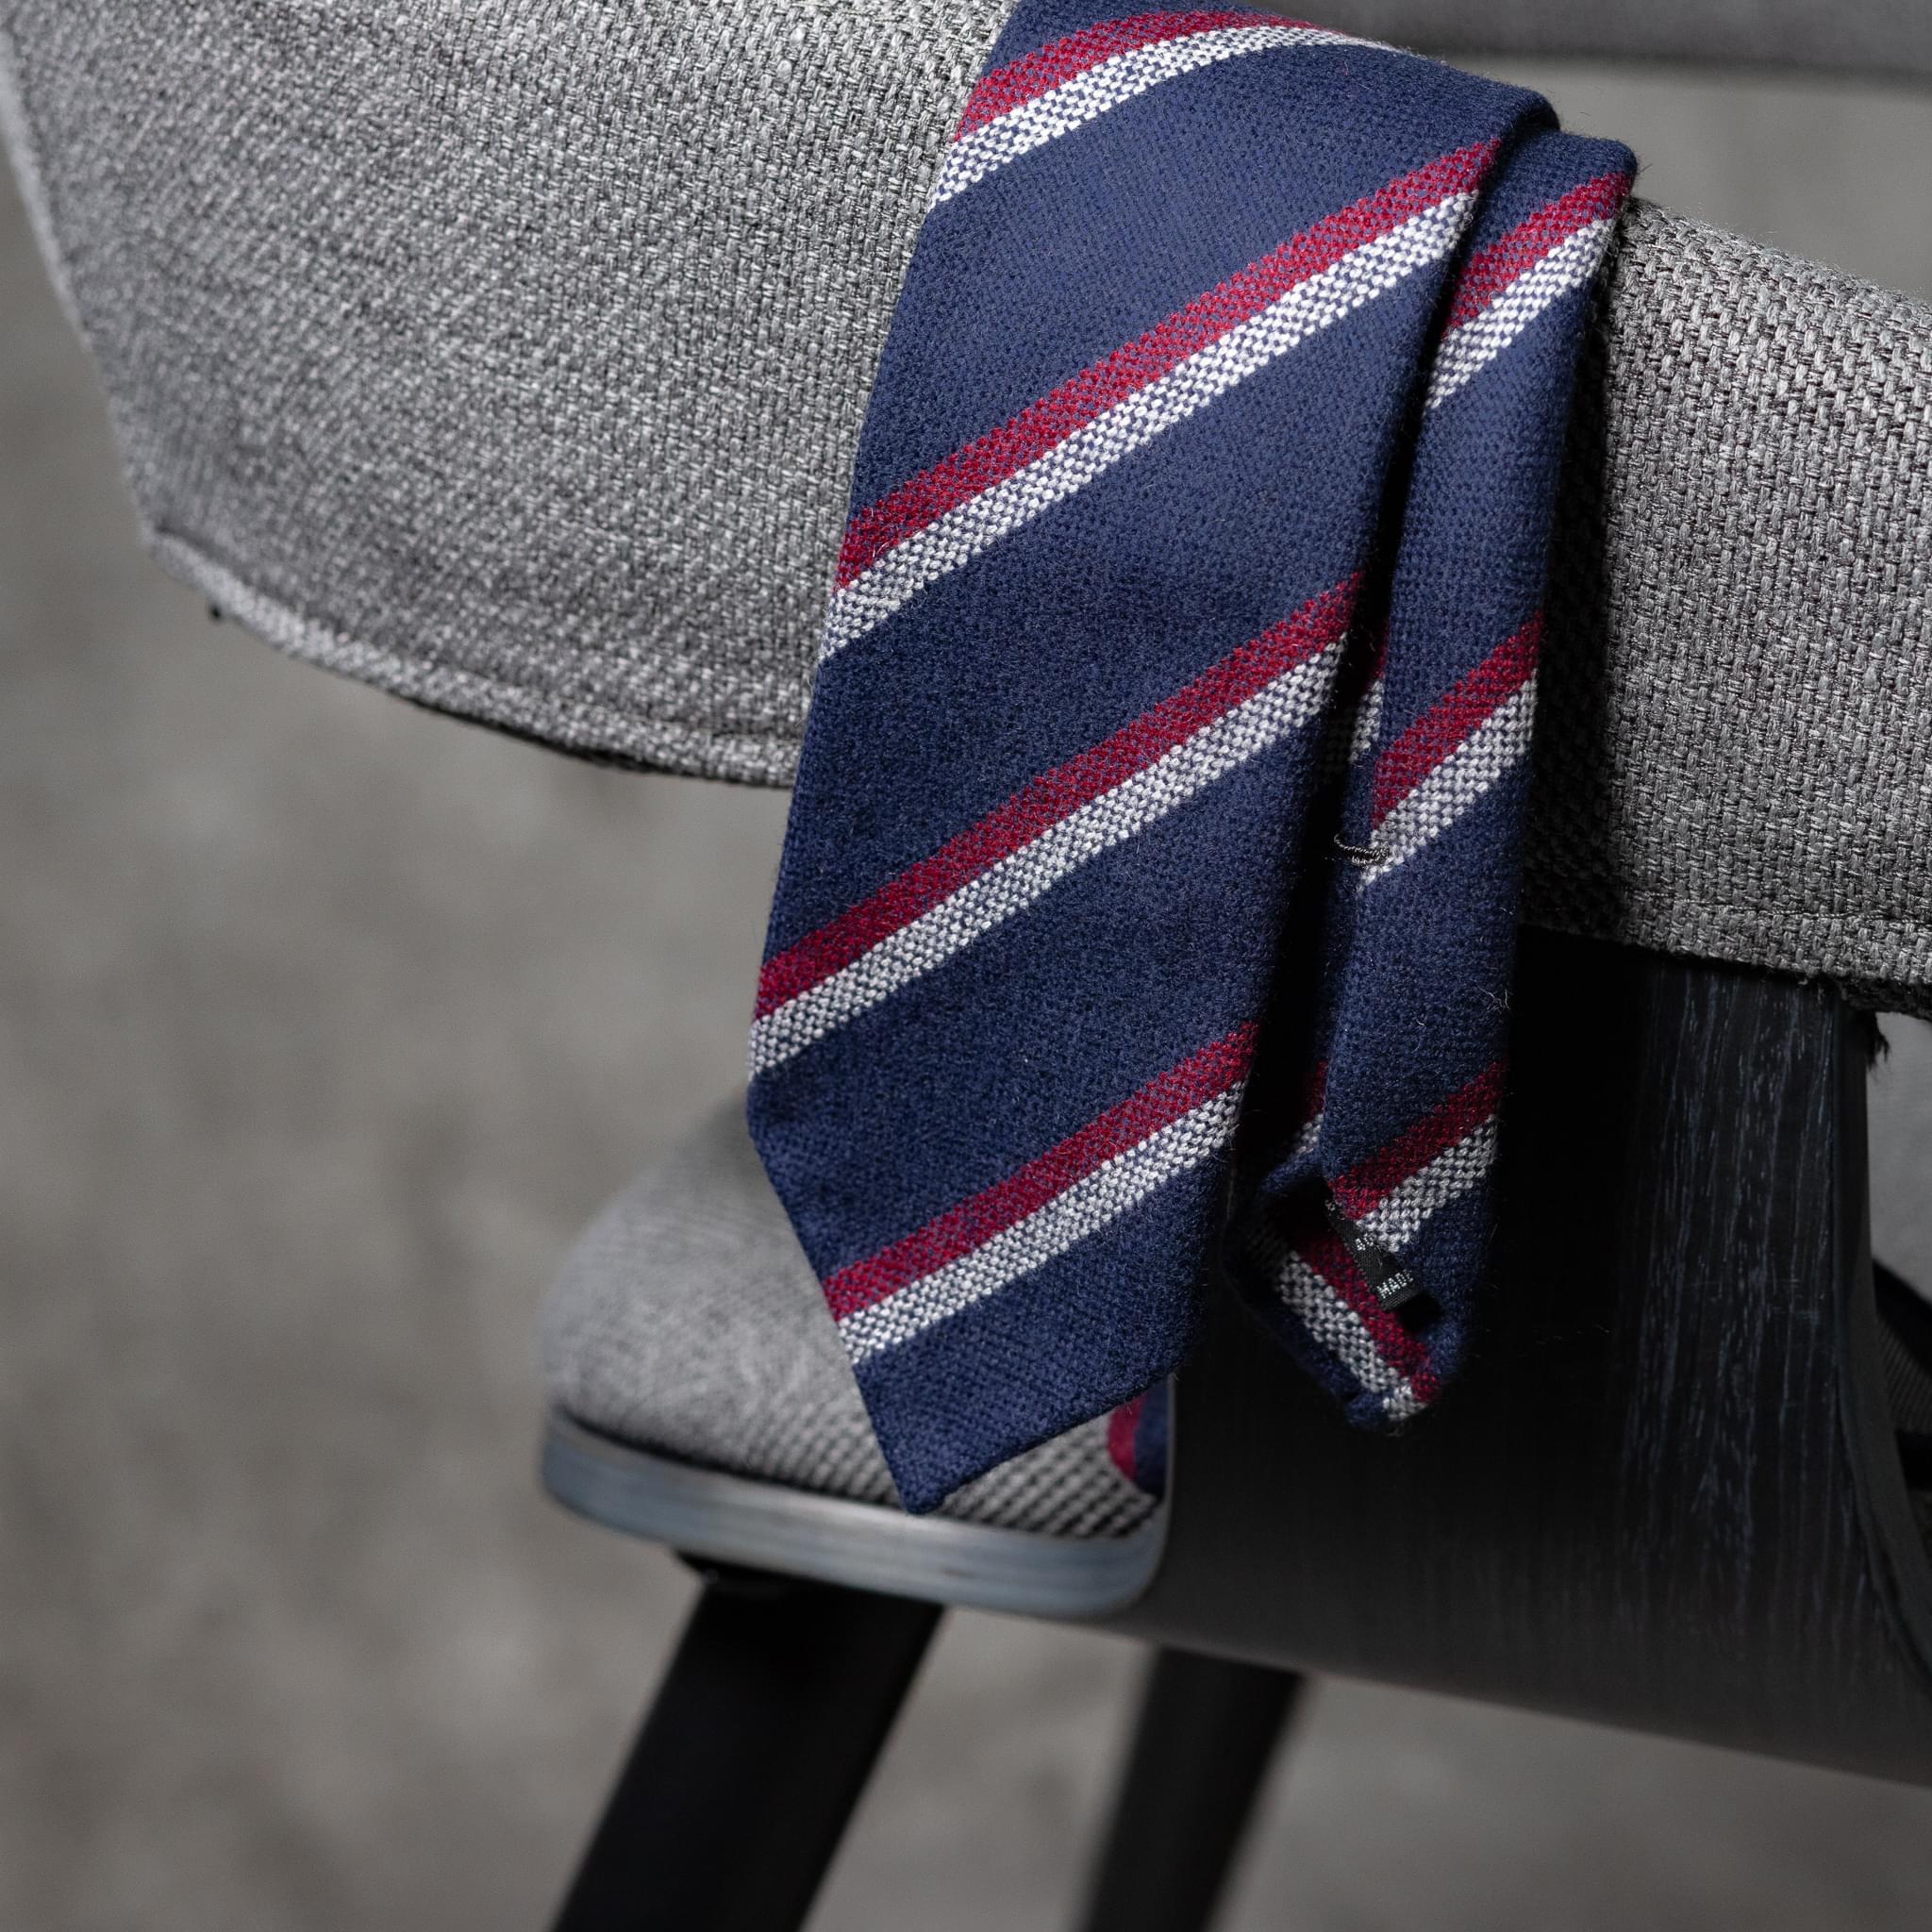 WOOL-LANA-0519-Tie-Initials-Corbata-Iniciales-The-Seelk-4